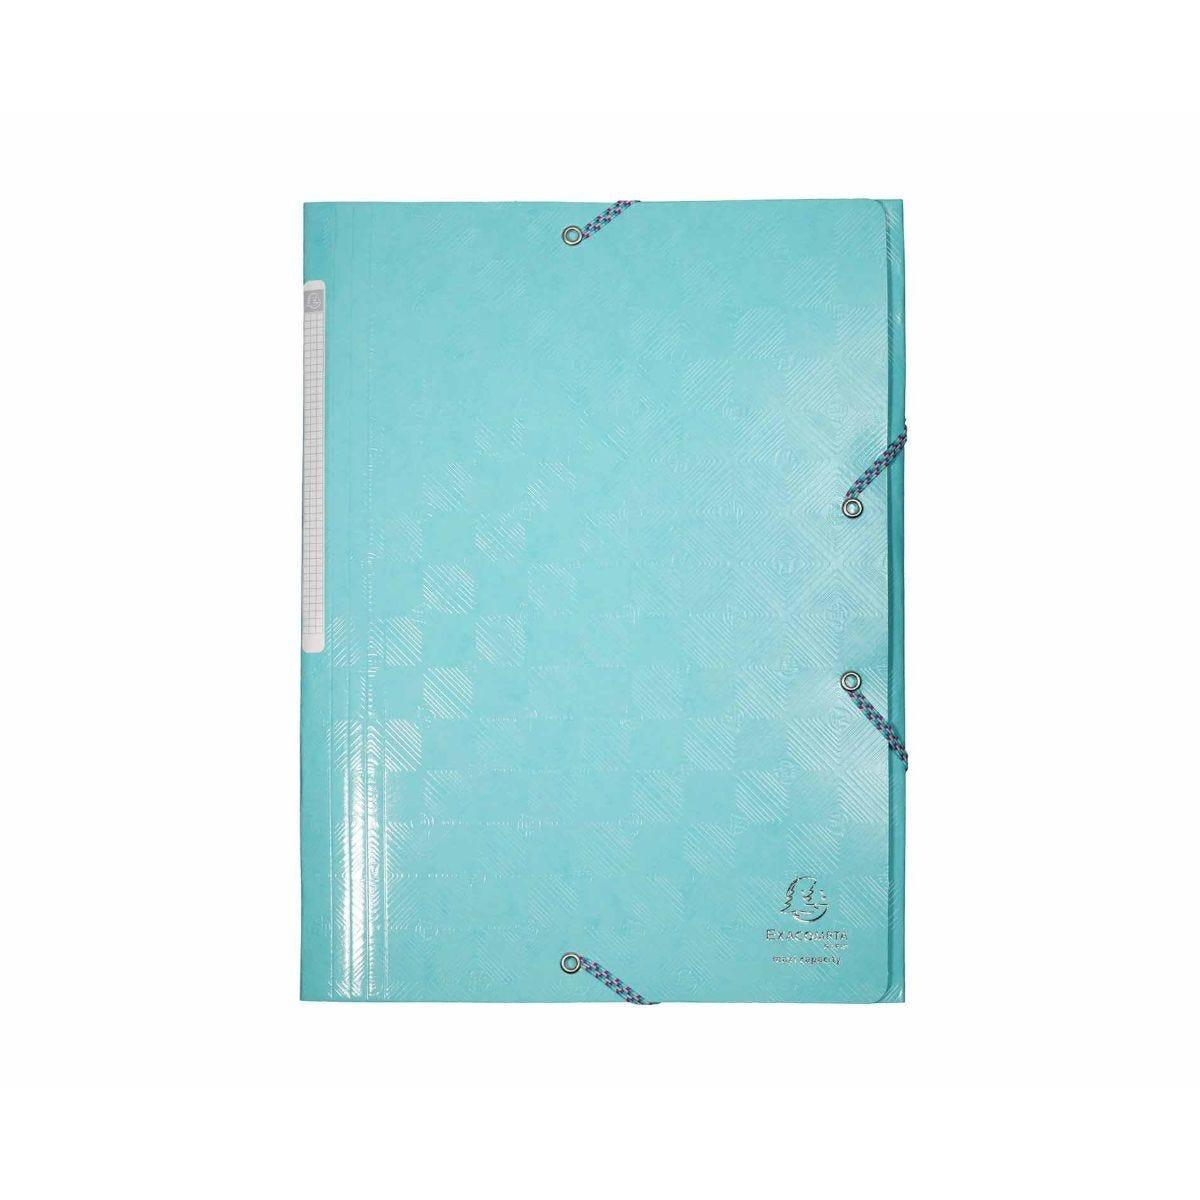 Exacompta Kreacover 3 Flap Folder A4 Pack of 25 Blue